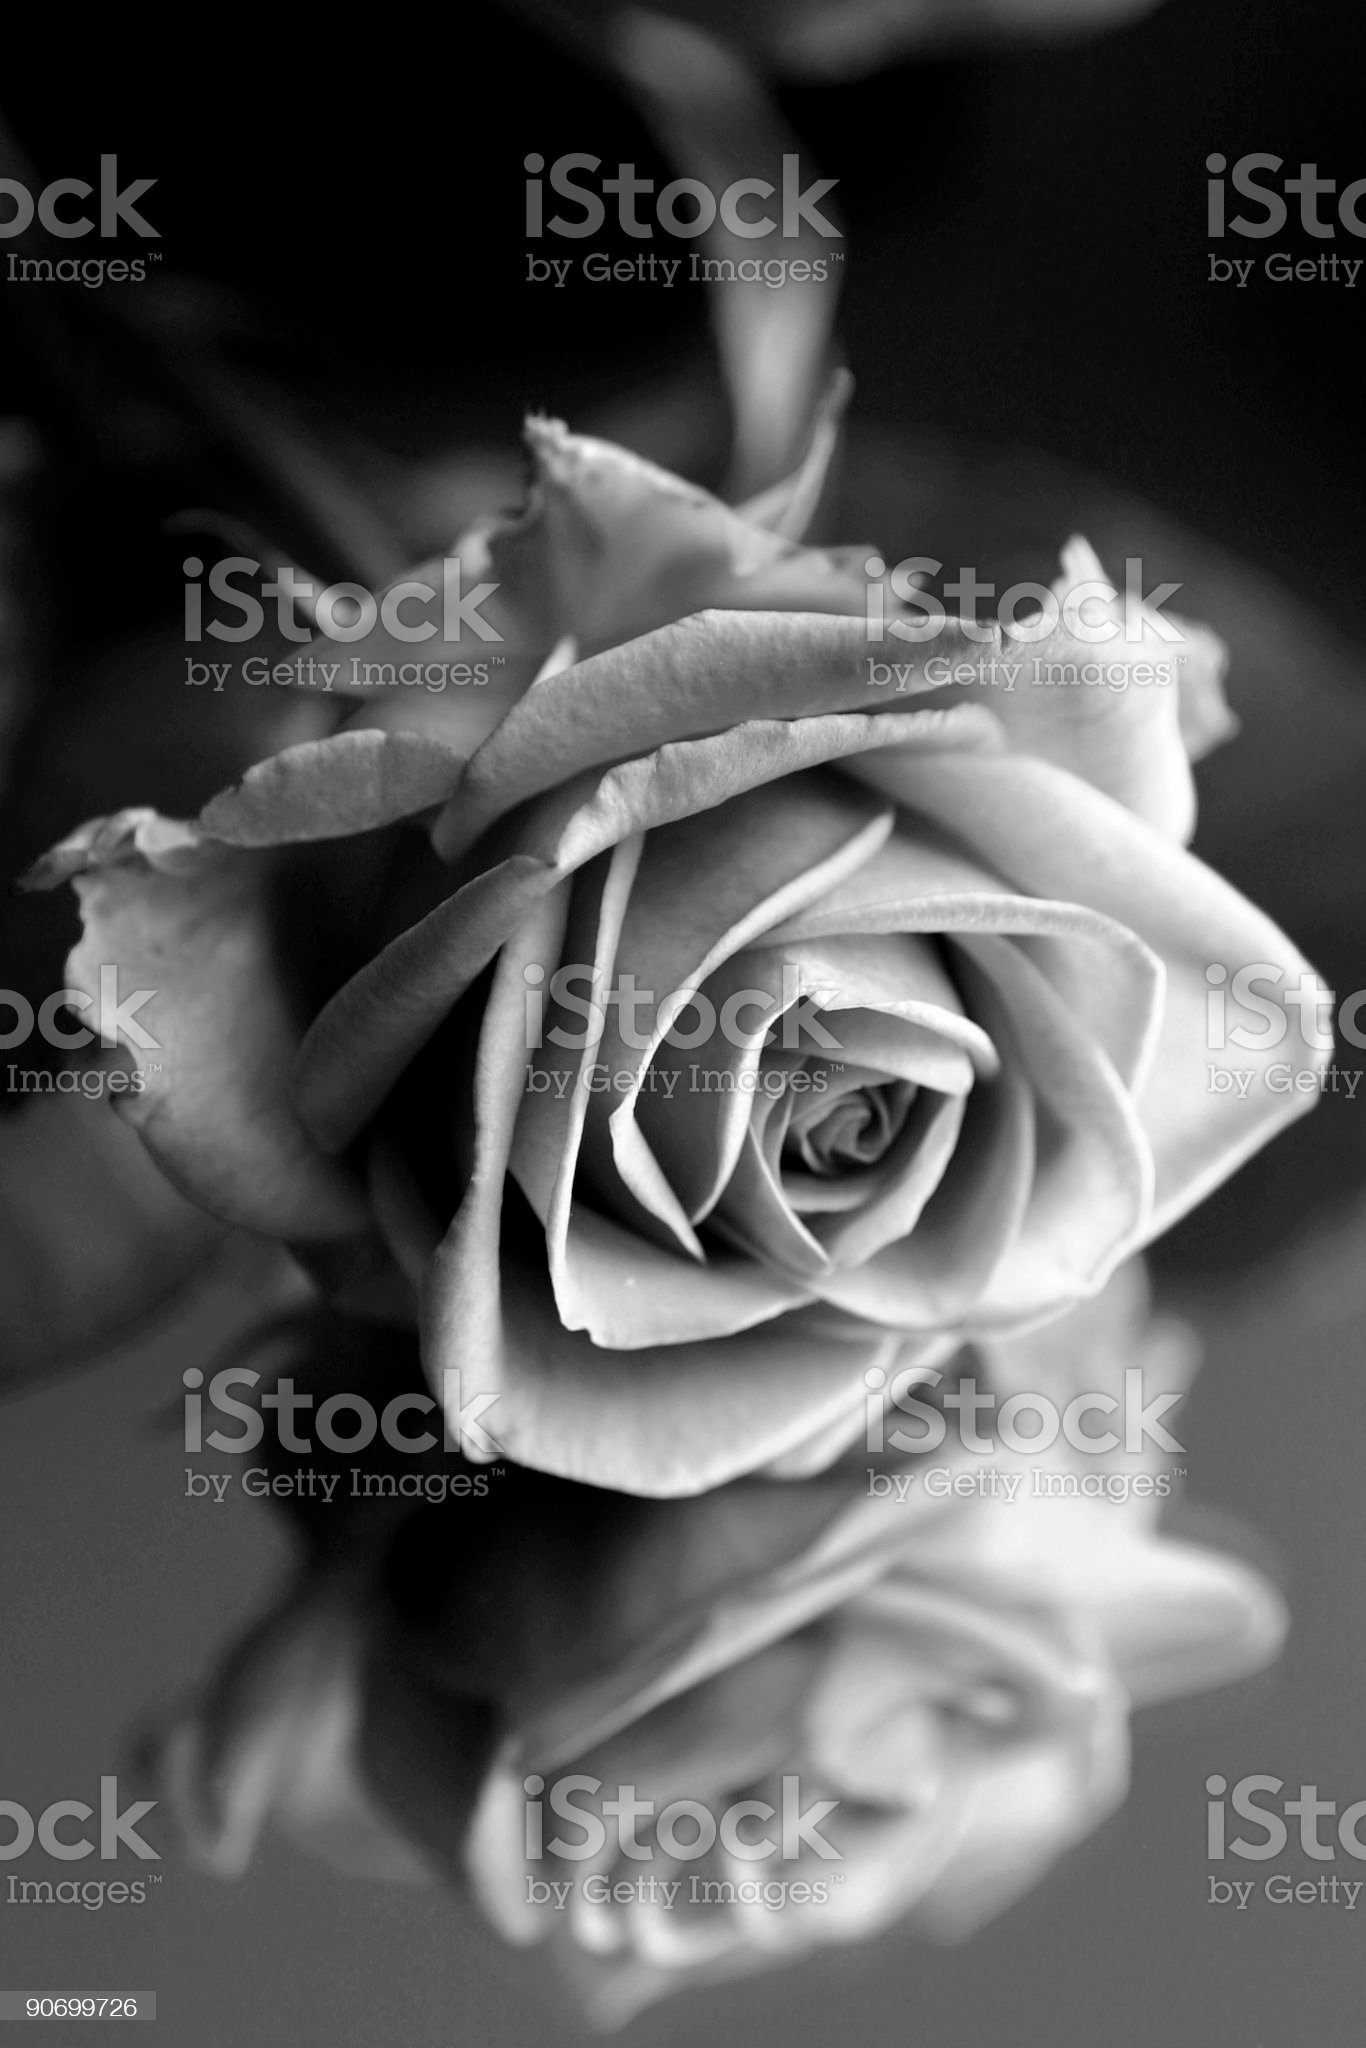 Fallen Rose royalty-free stock photo